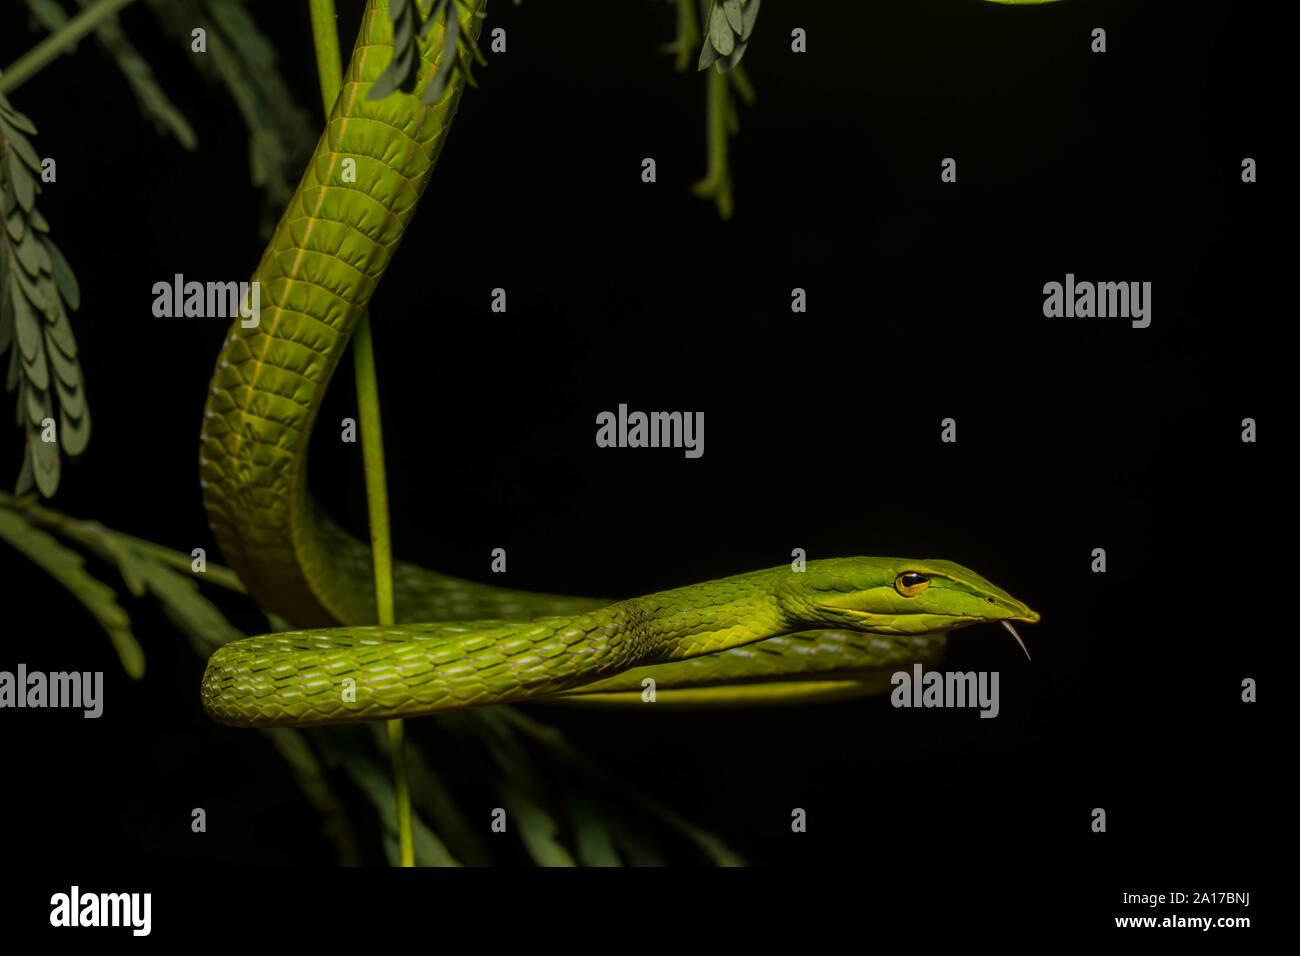 Whipsnake bec long (Ahaetulla nasuta) de la province de Prachuap Khiri Khan, Thaïlande. Banque D'Images